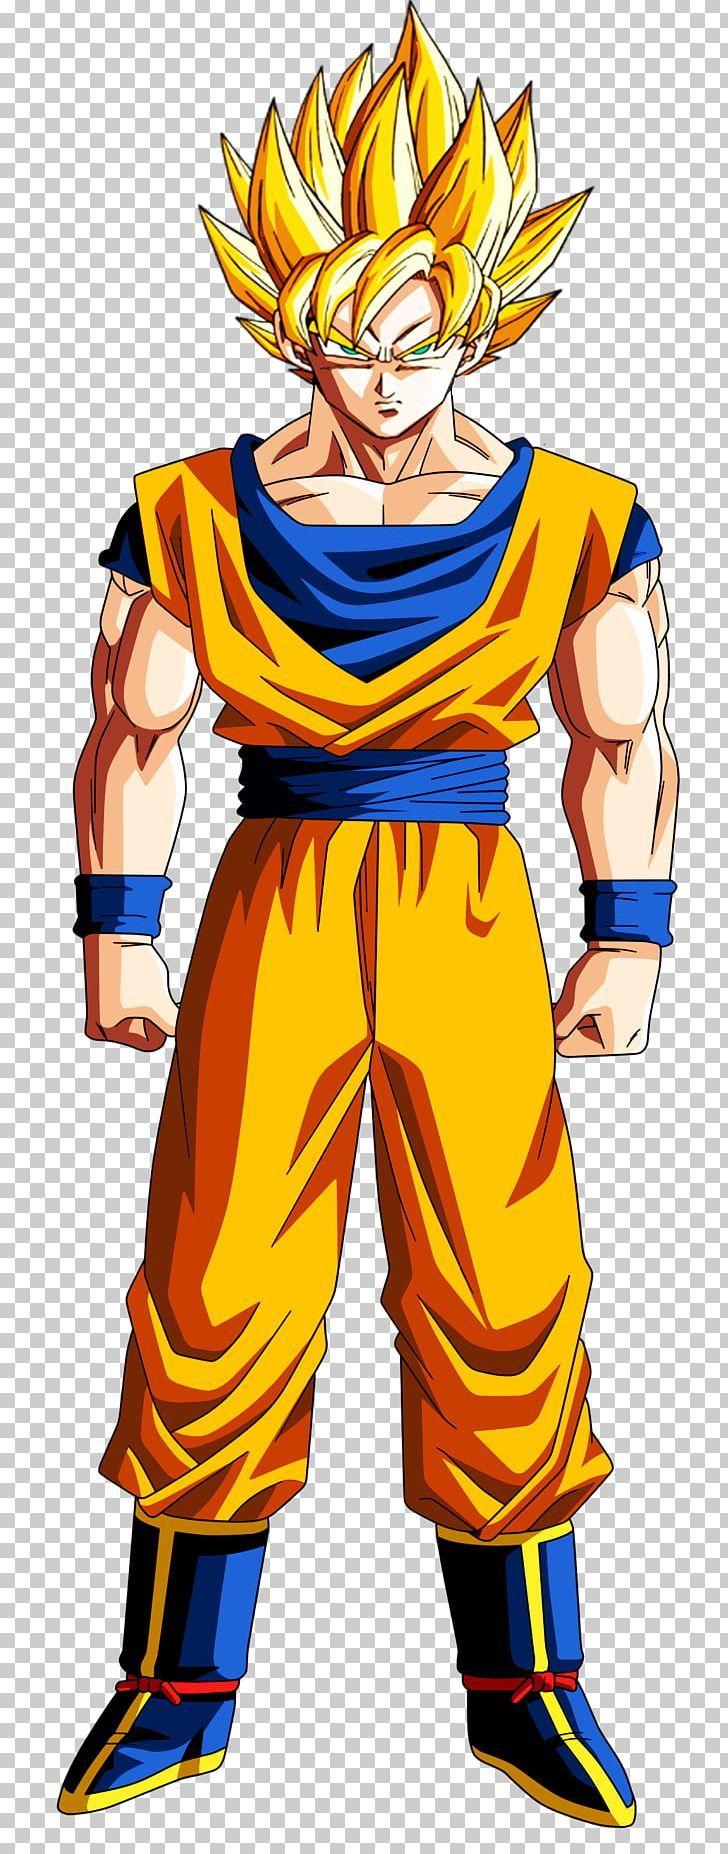 Goku Gohan Vegeta Dragon Ball Super Saiya Png Clipart Anime Art Artwork Cartoon Costume Free Png Download Goku Goku Desenho Goku Super Sayajin